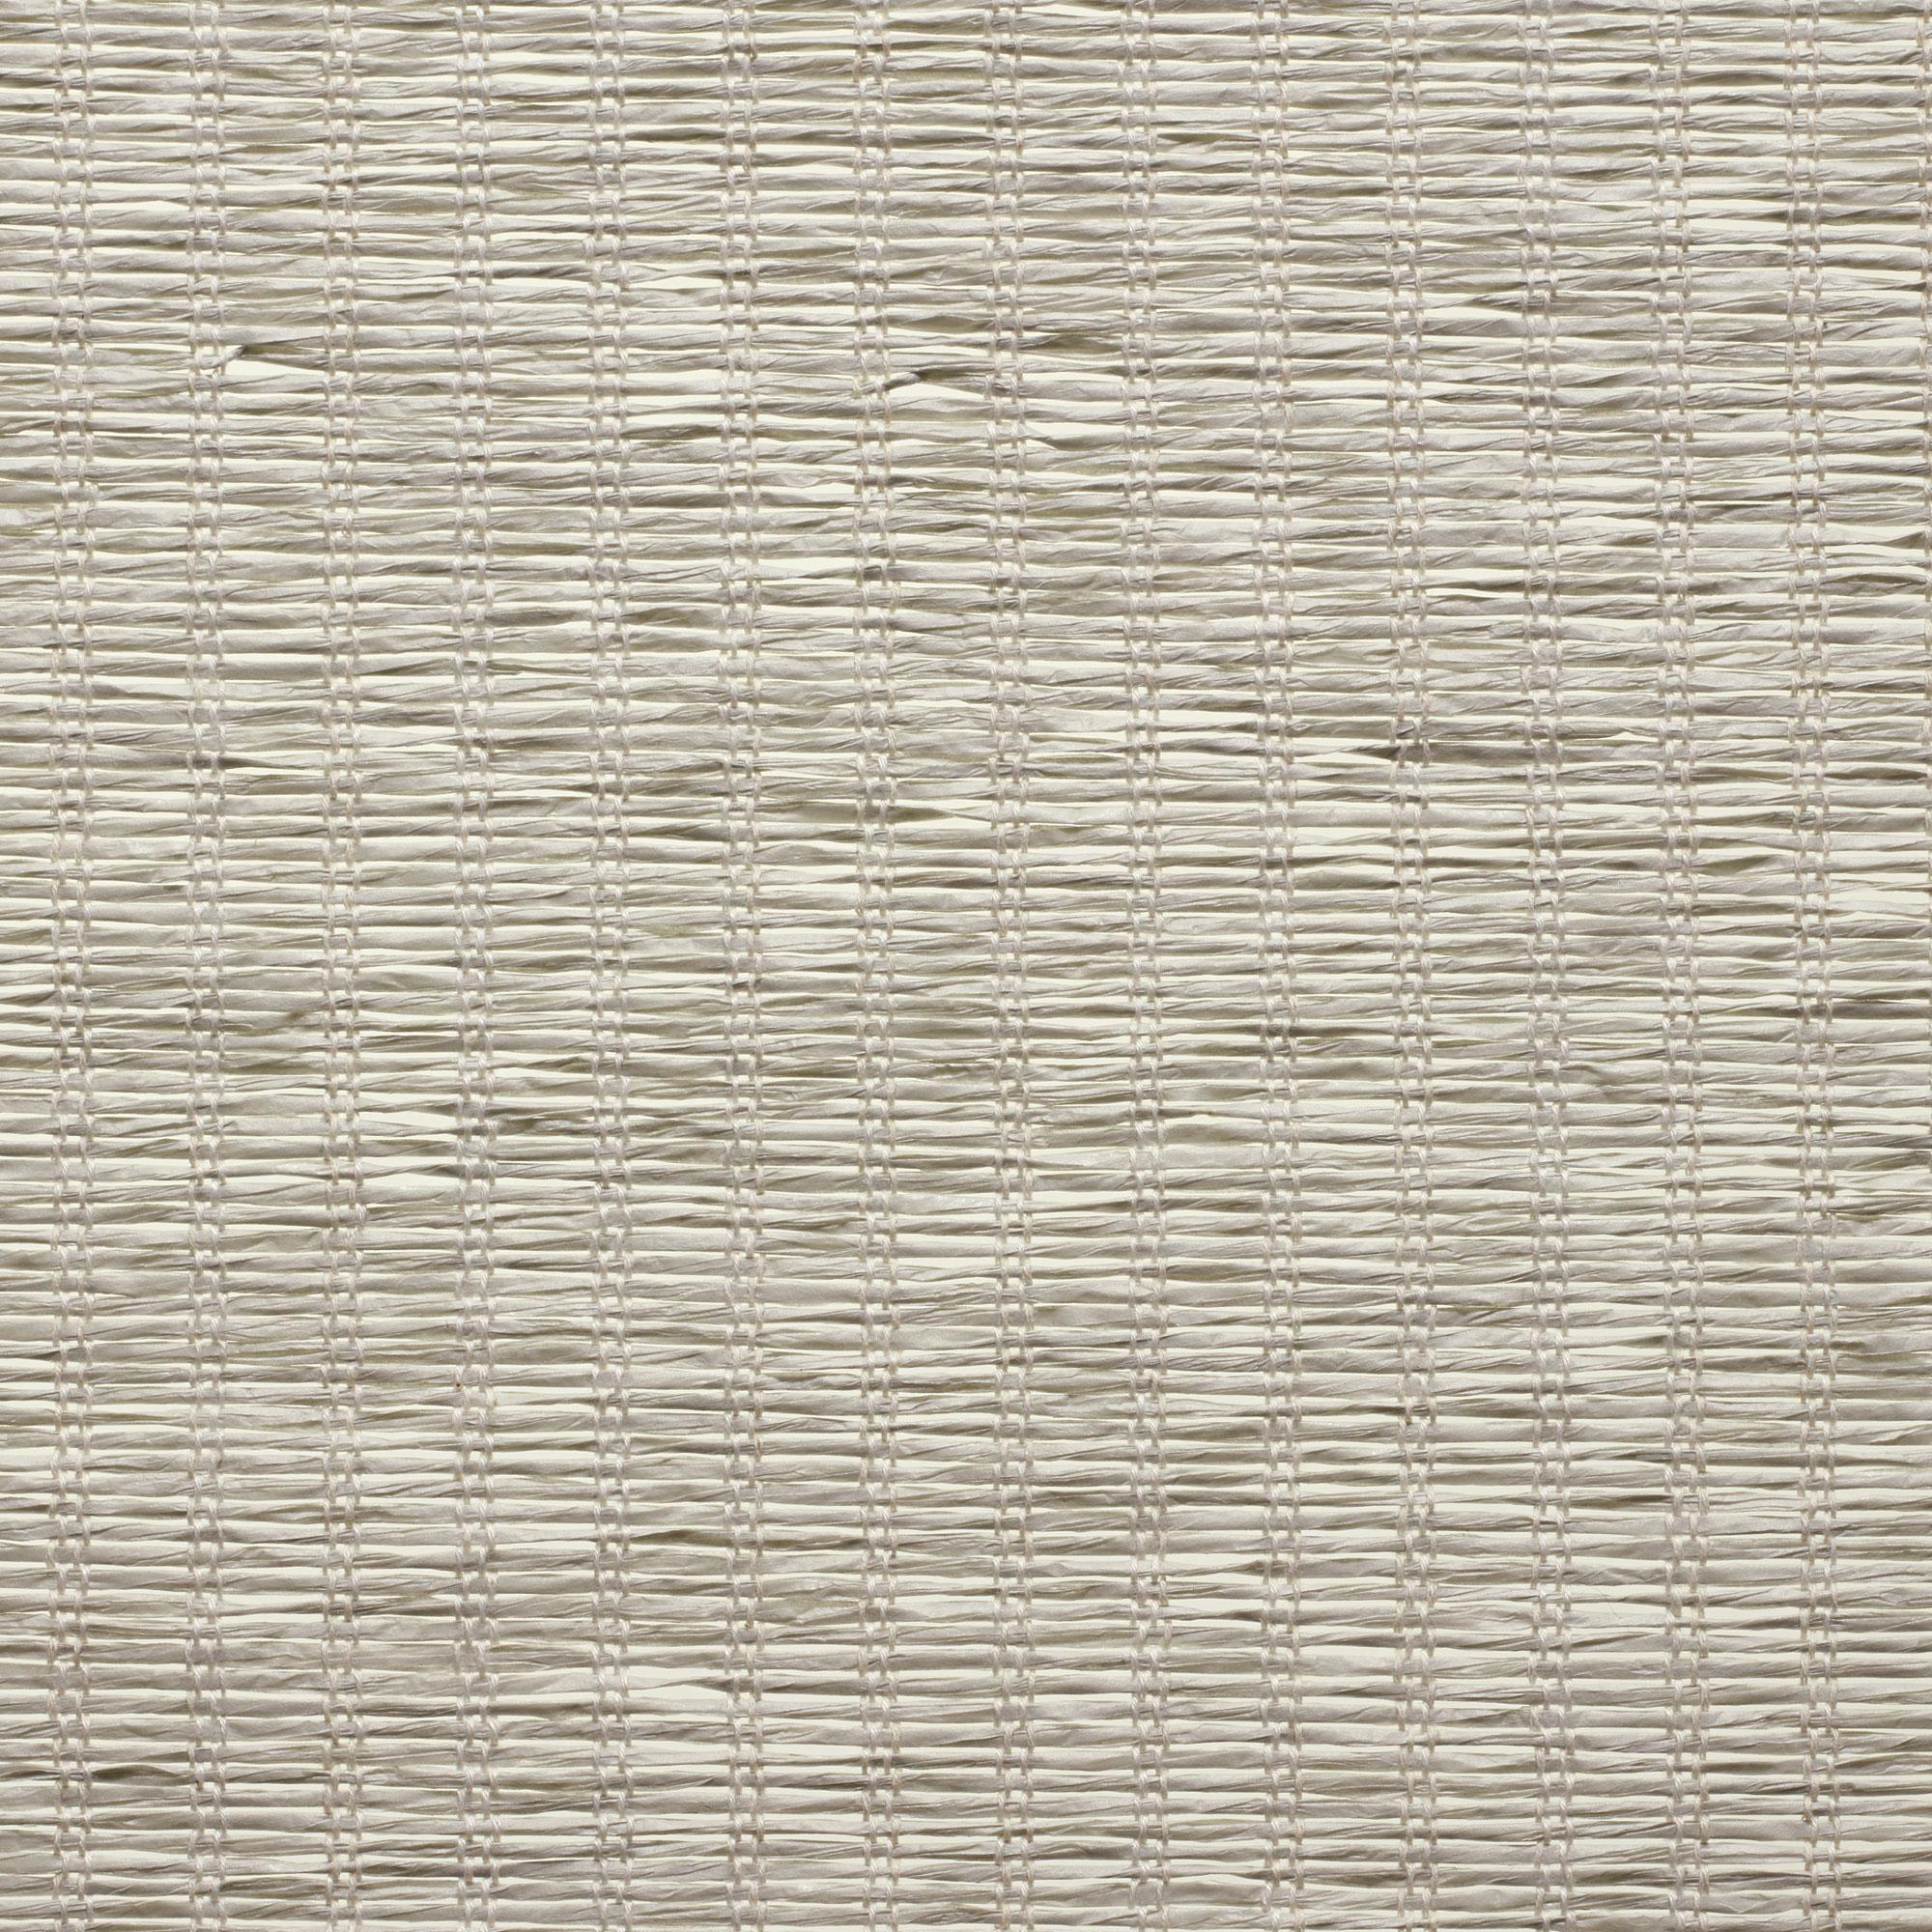 swatch-PE604-36-enlightenment-contented-grey-web.jpg